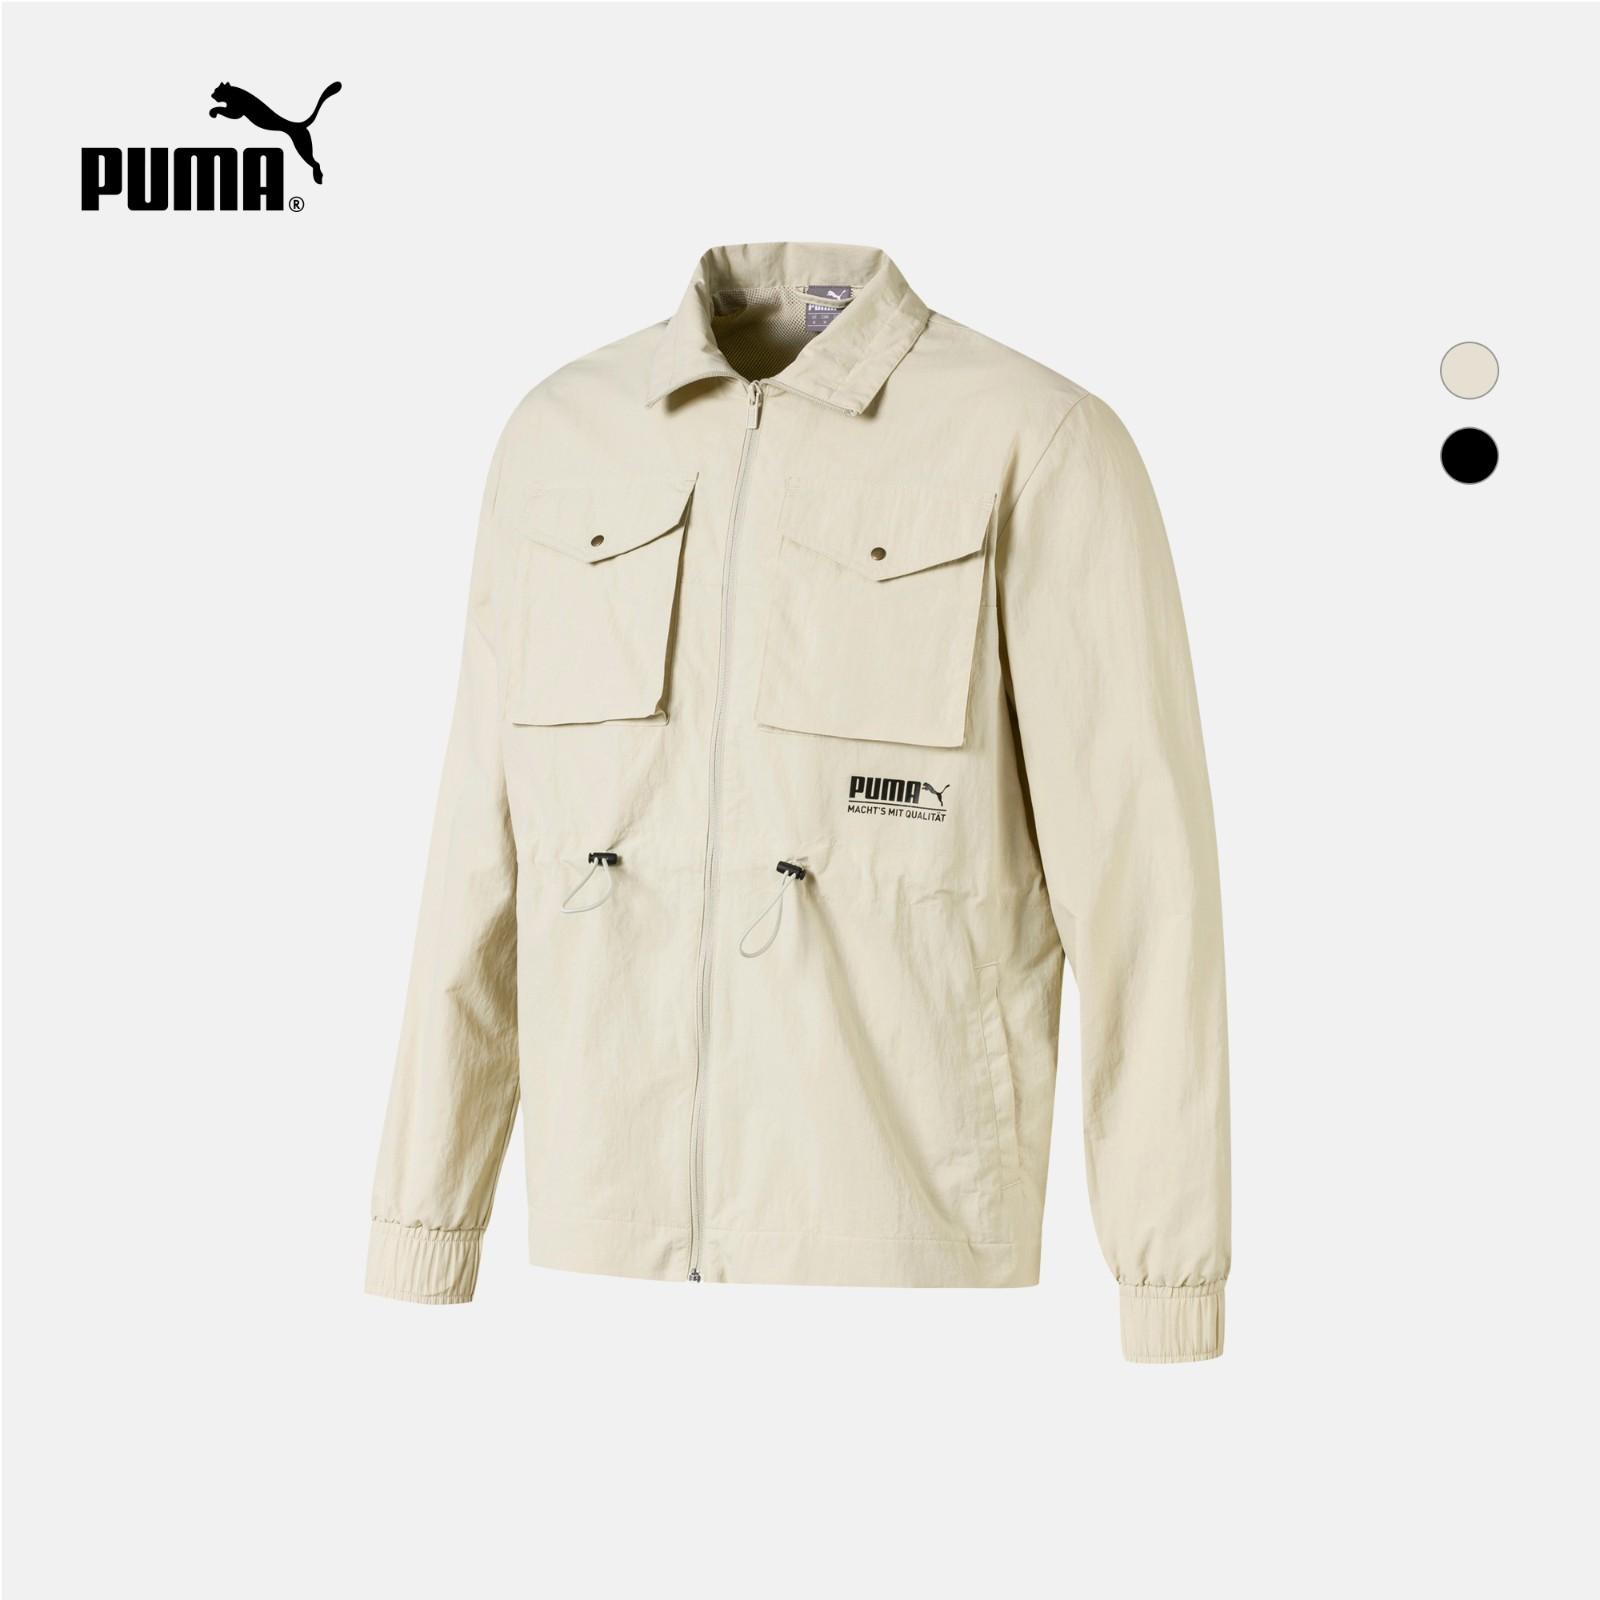 PUMA 彪马 SPORTS 596861 男子休闲拉链立领外套夹克